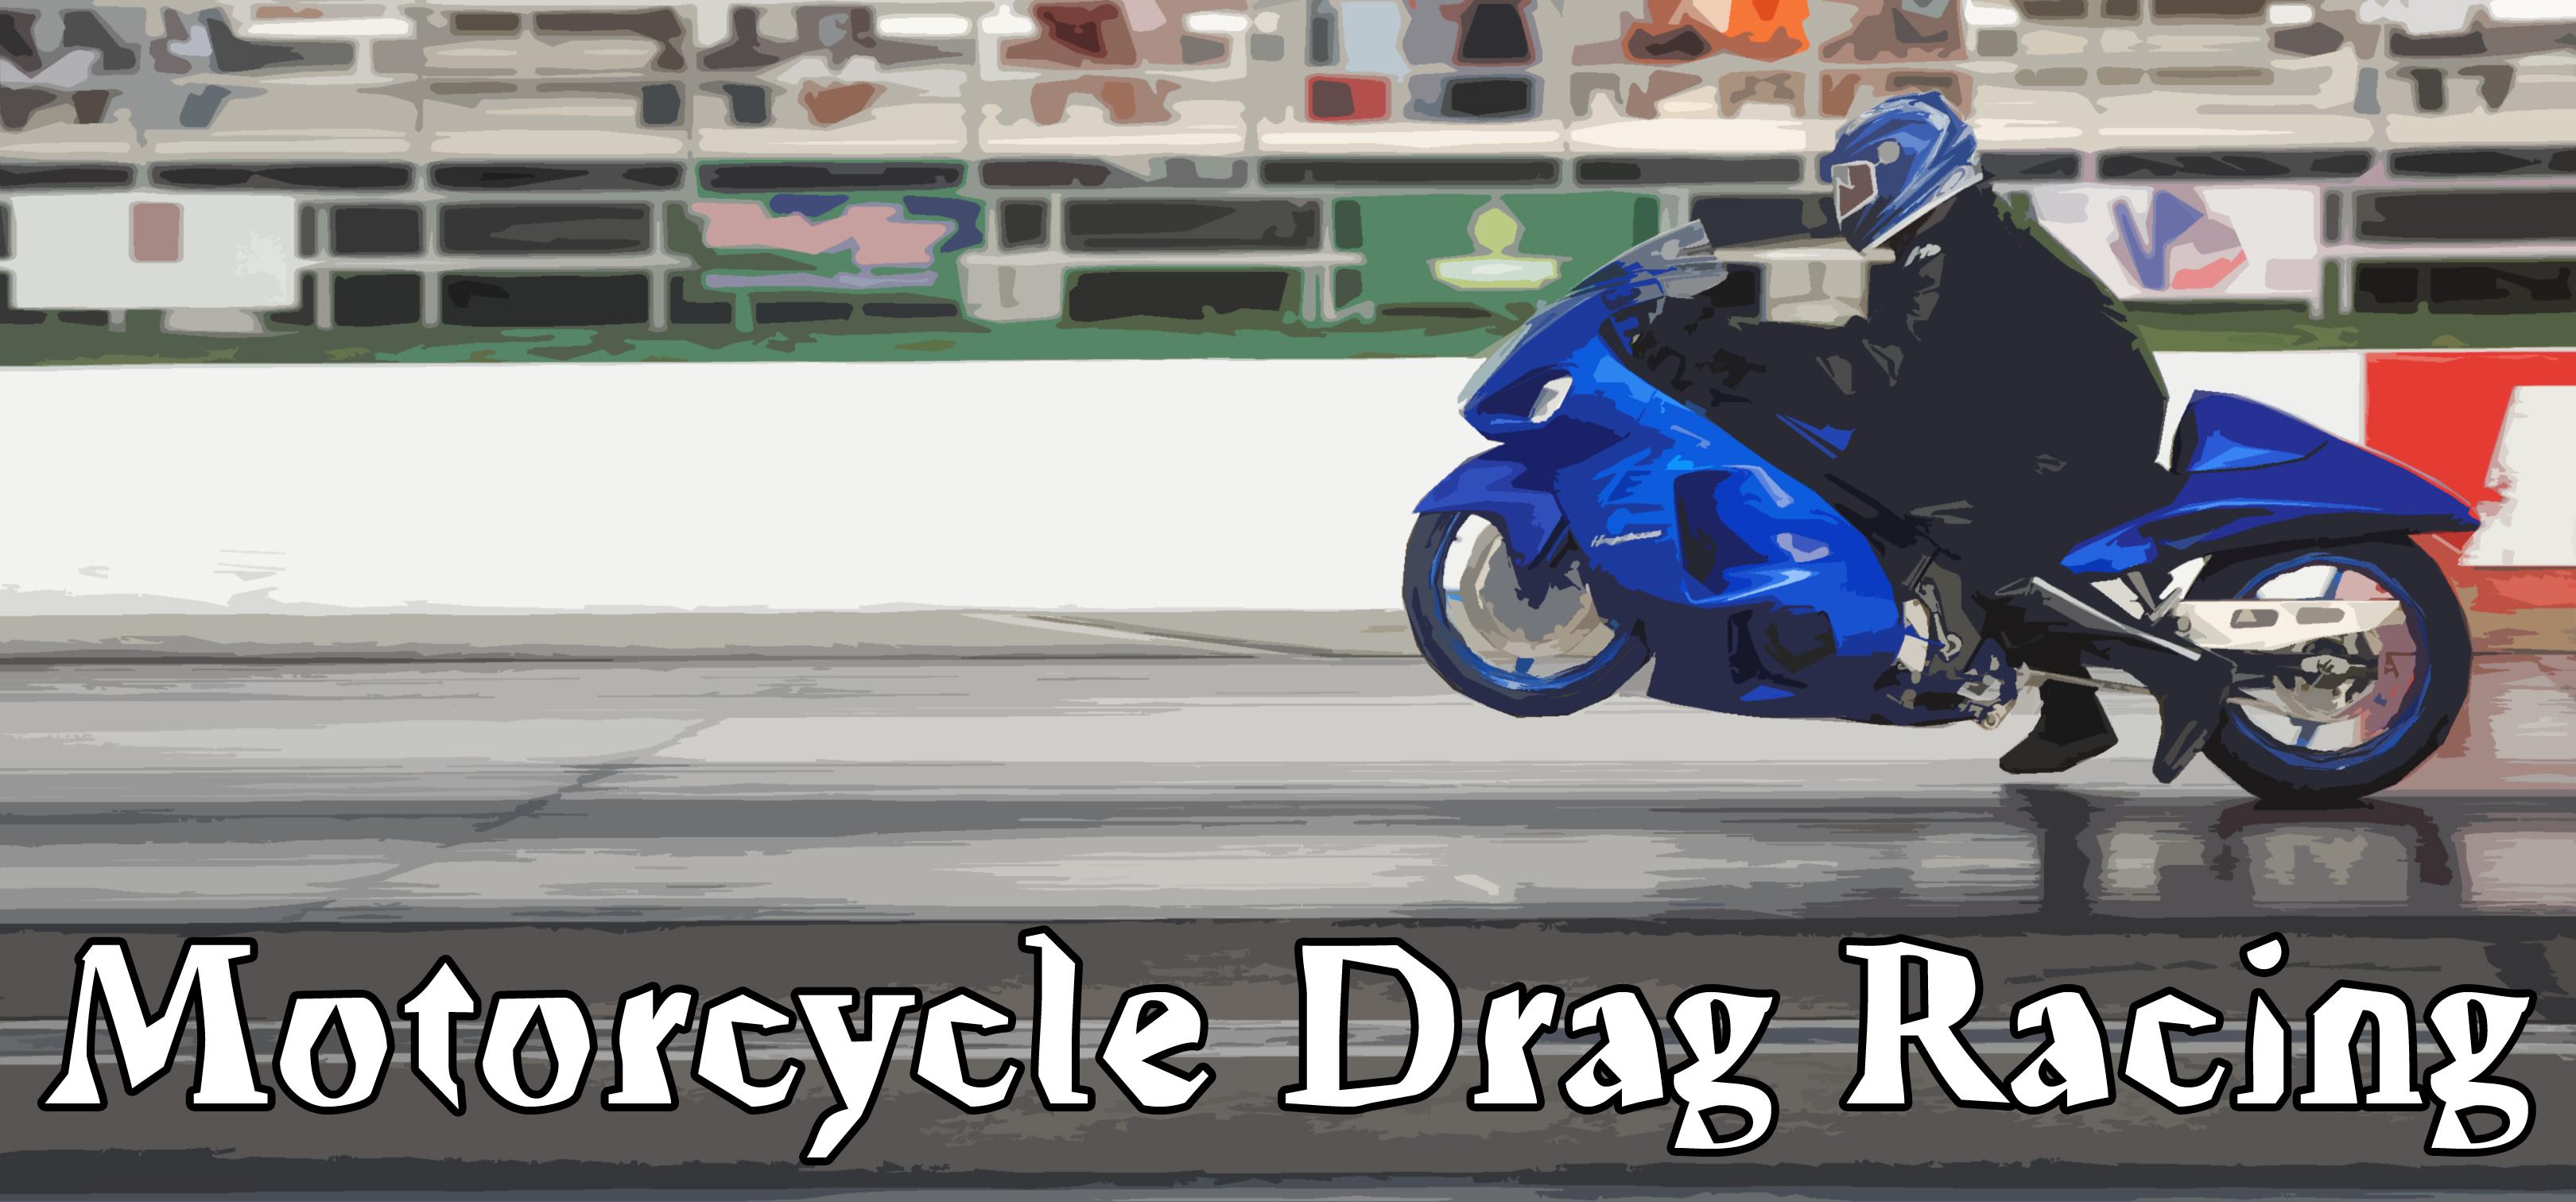 Turbo Hayabusa Motorcycle Drag Racing Graphic By Wyldfantasyx On